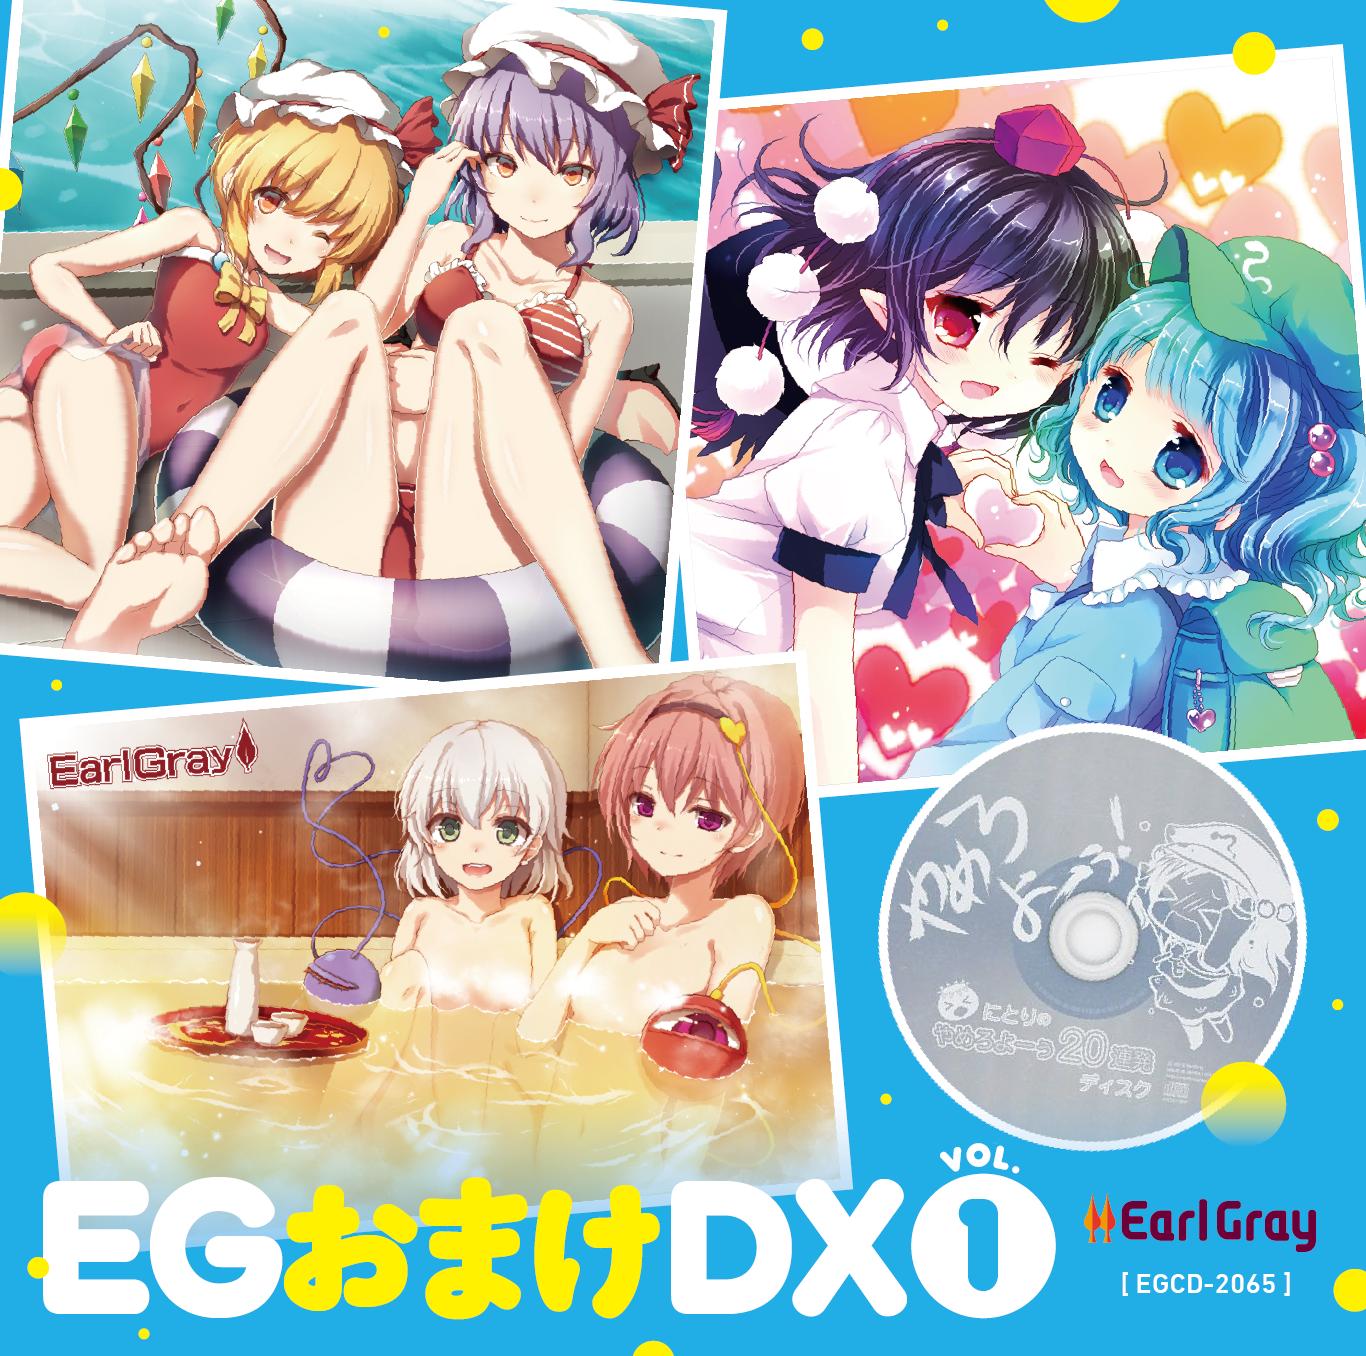 「EG おまけDX Vol.1」